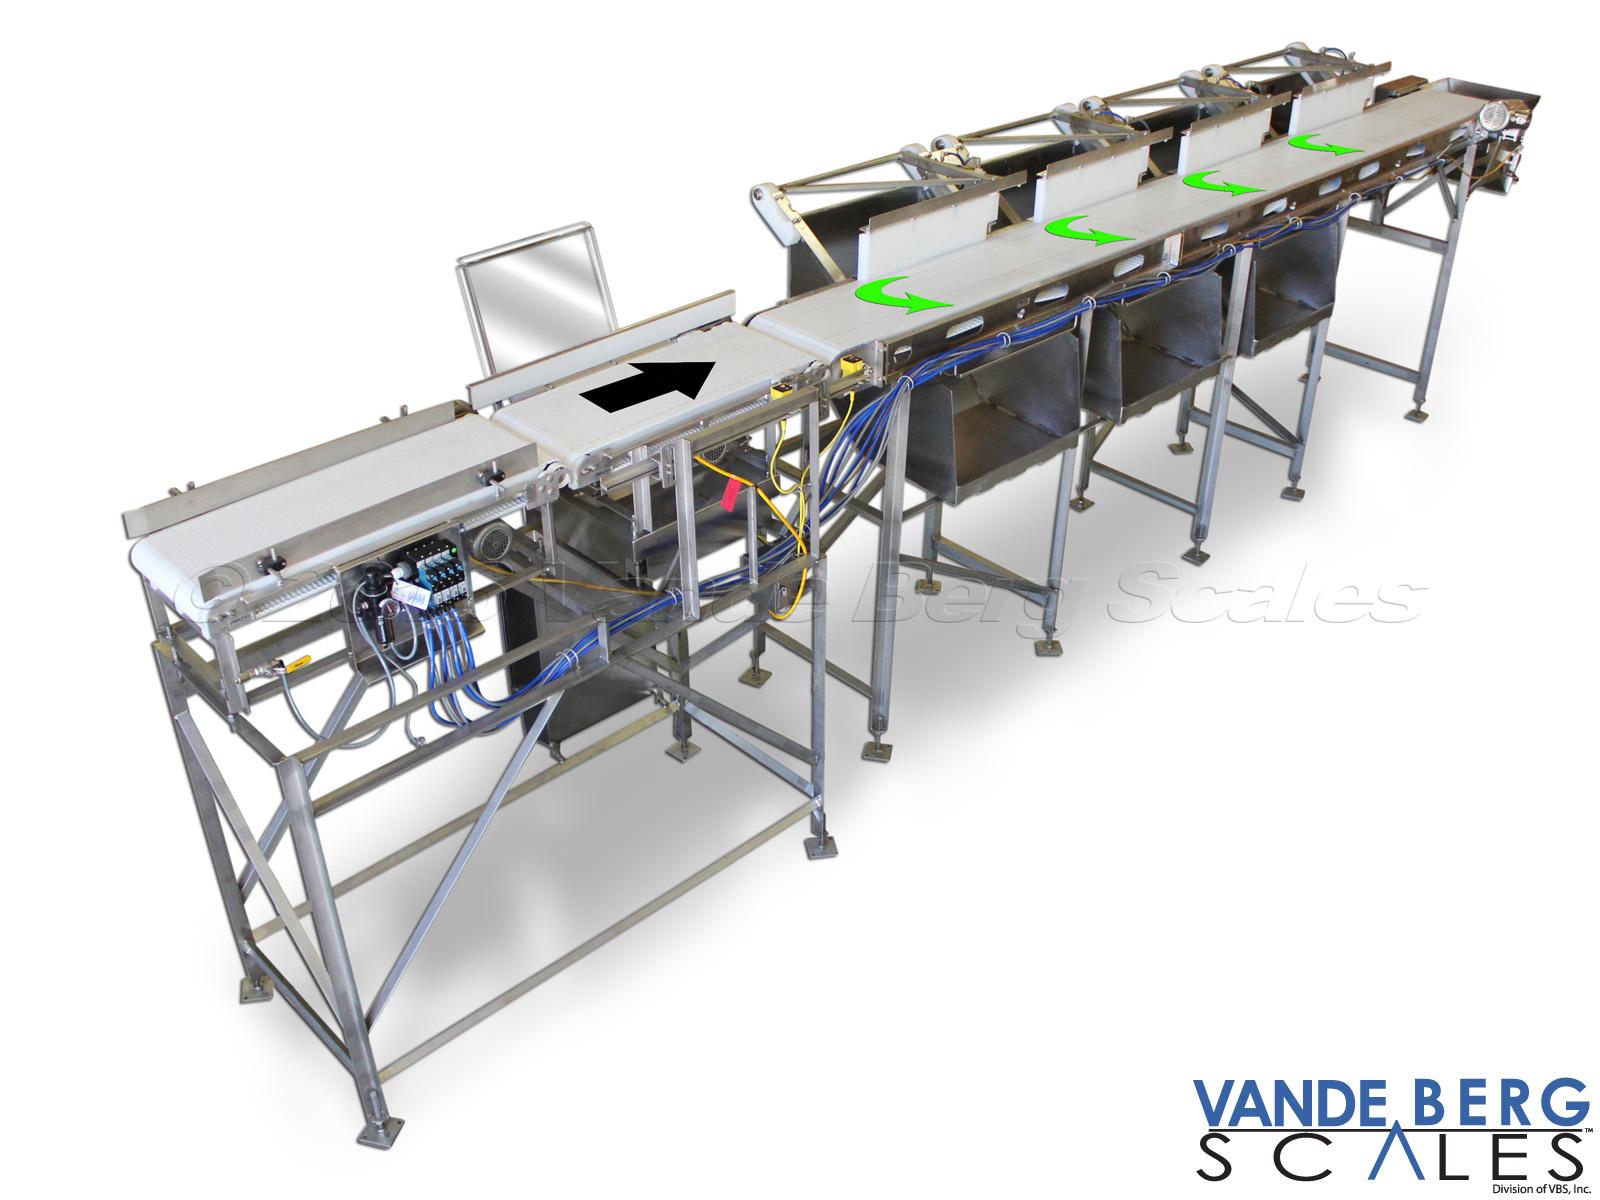 4-bin rib sortation system with pull-off diverts.